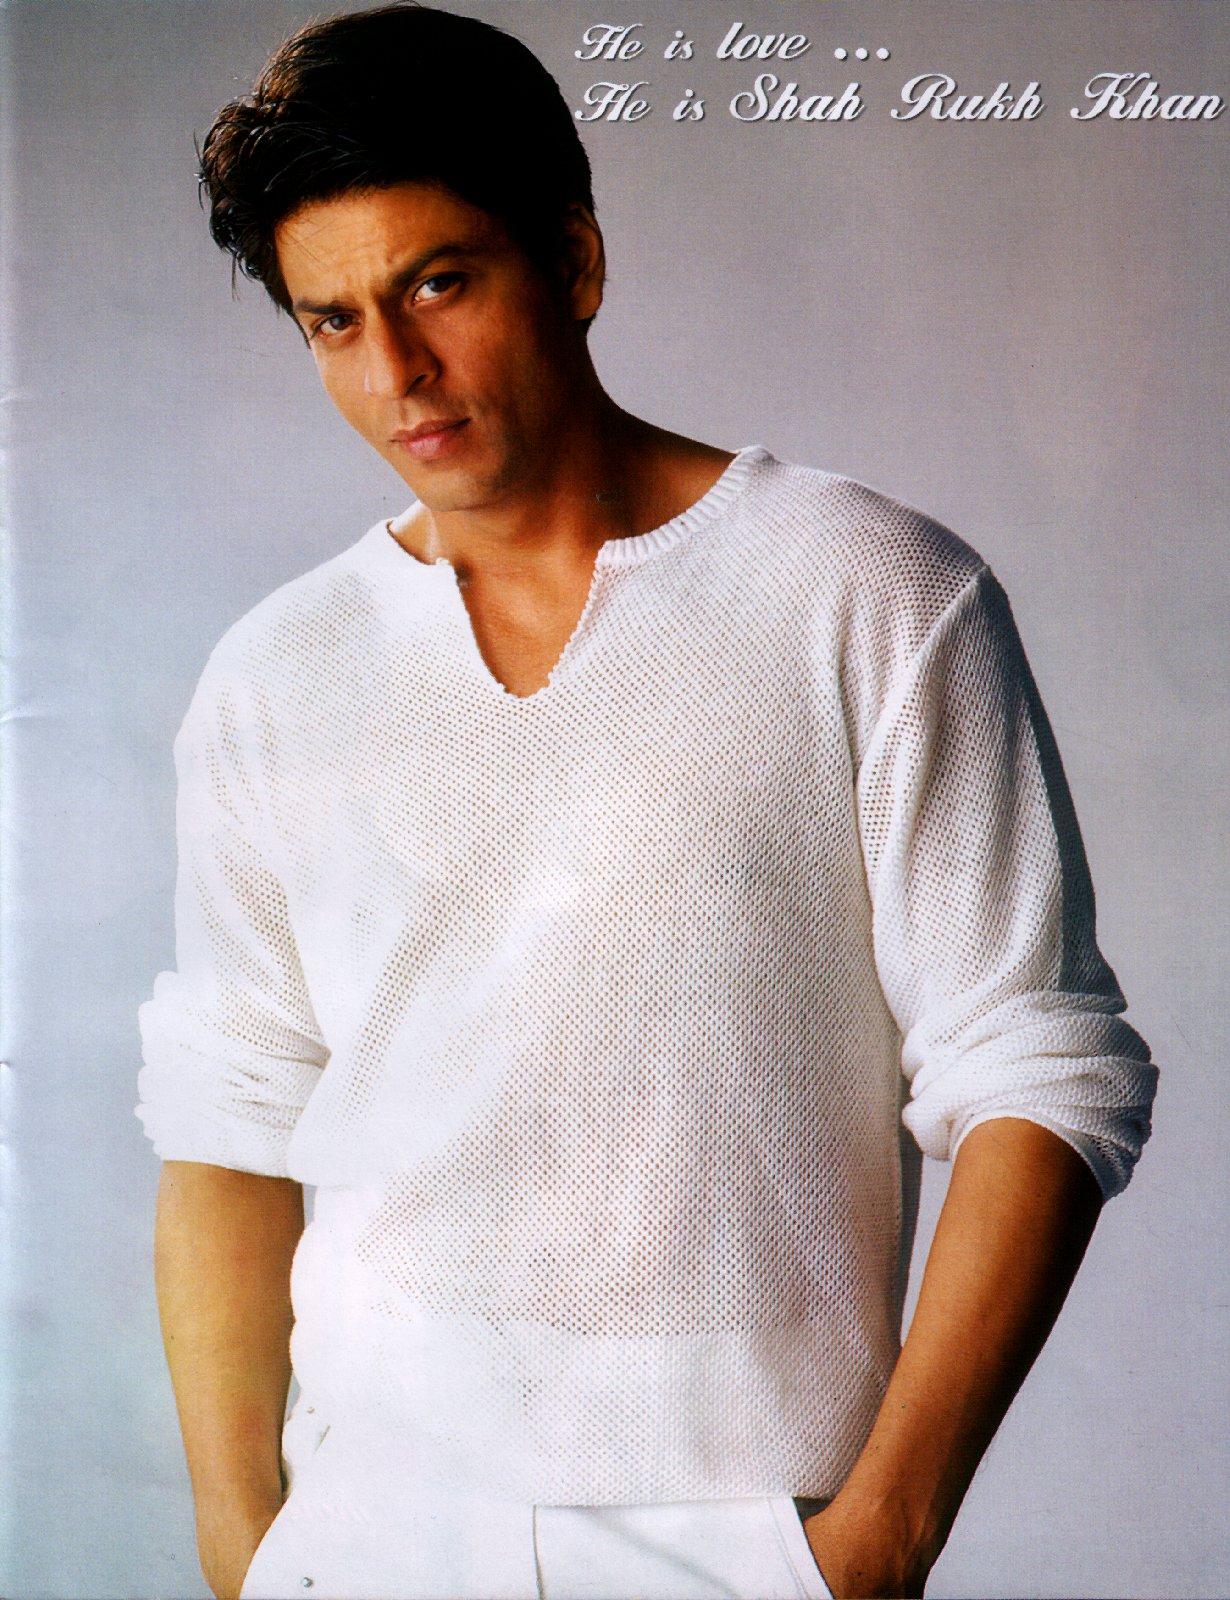 http://1.bp.blogspot.com/-NeZdag3jEF4/Teb1v5XG7II/AAAAAAAAAC0/-DEBhf4VbKA/s1600/Downloads-Wallpapers-Shahrukh-Khan.jpg